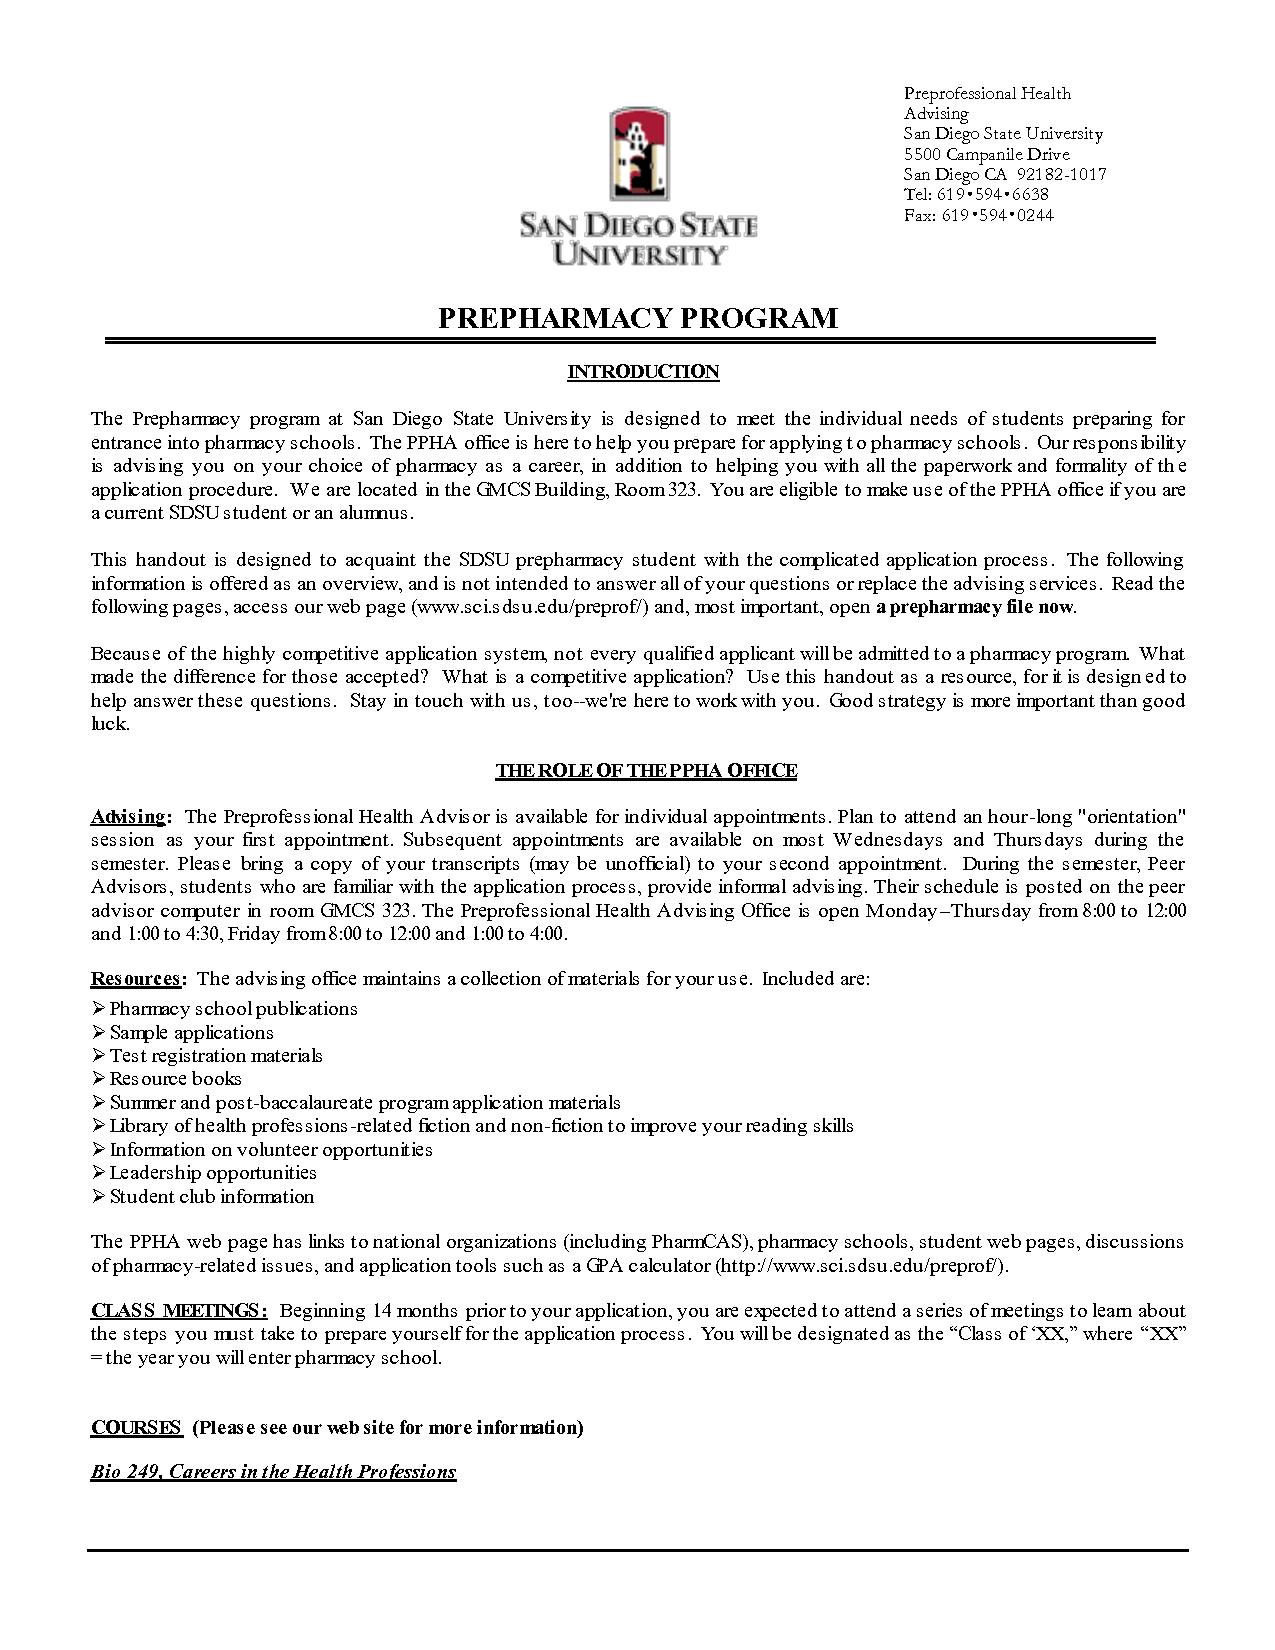 Cover Letter for Essay Template - Pharmacy School Essay Pharmacy School Essay Ideas for Othello